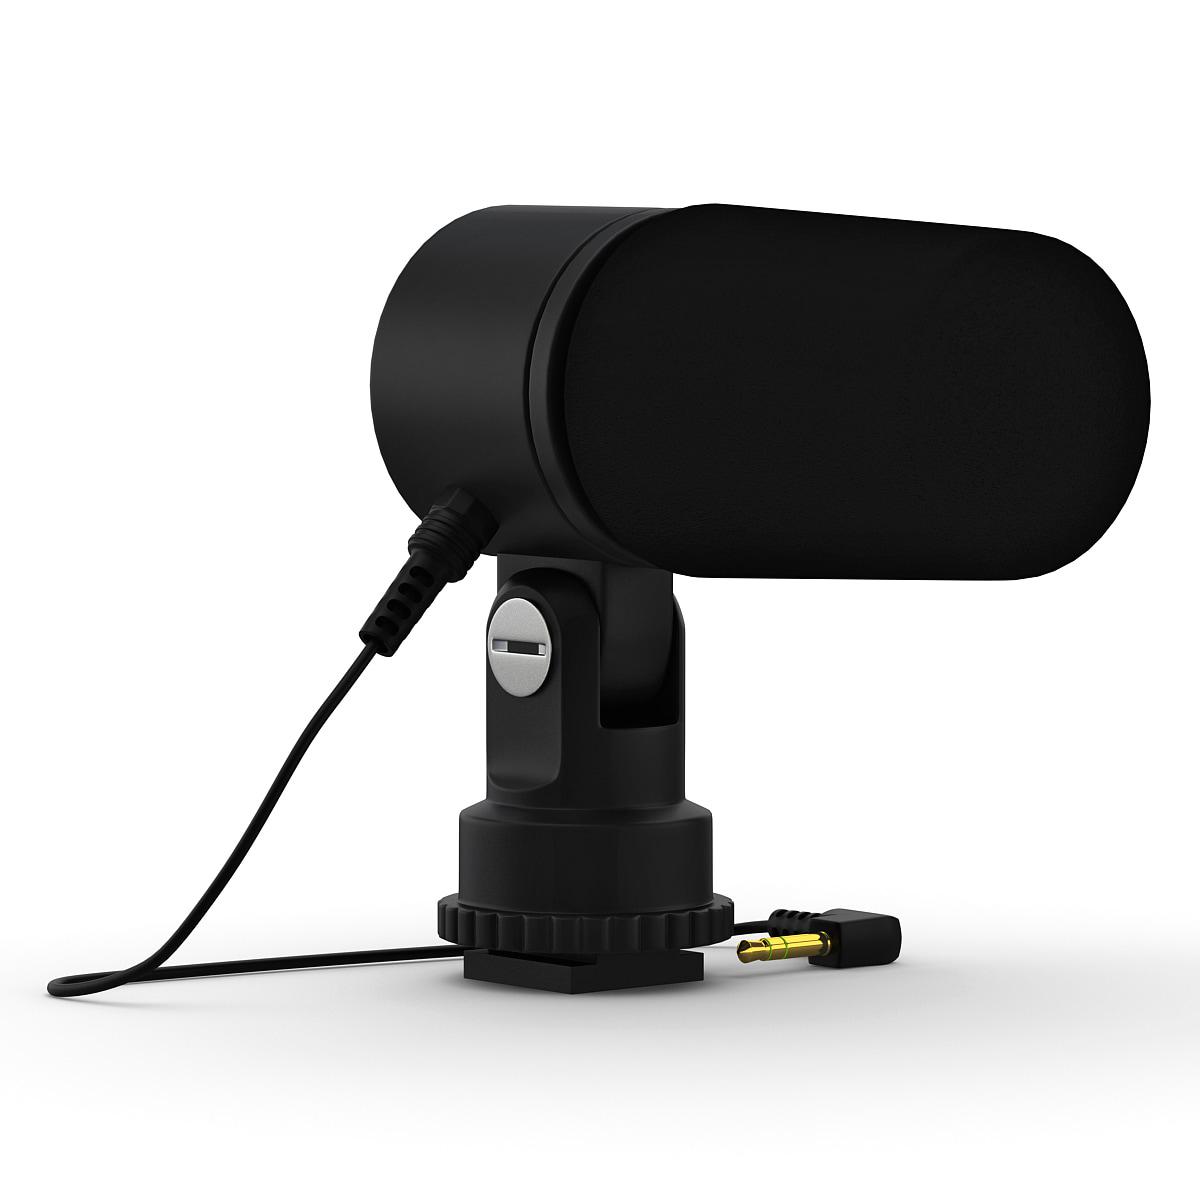 Nikon_Stereo_Microphone_001.jpg